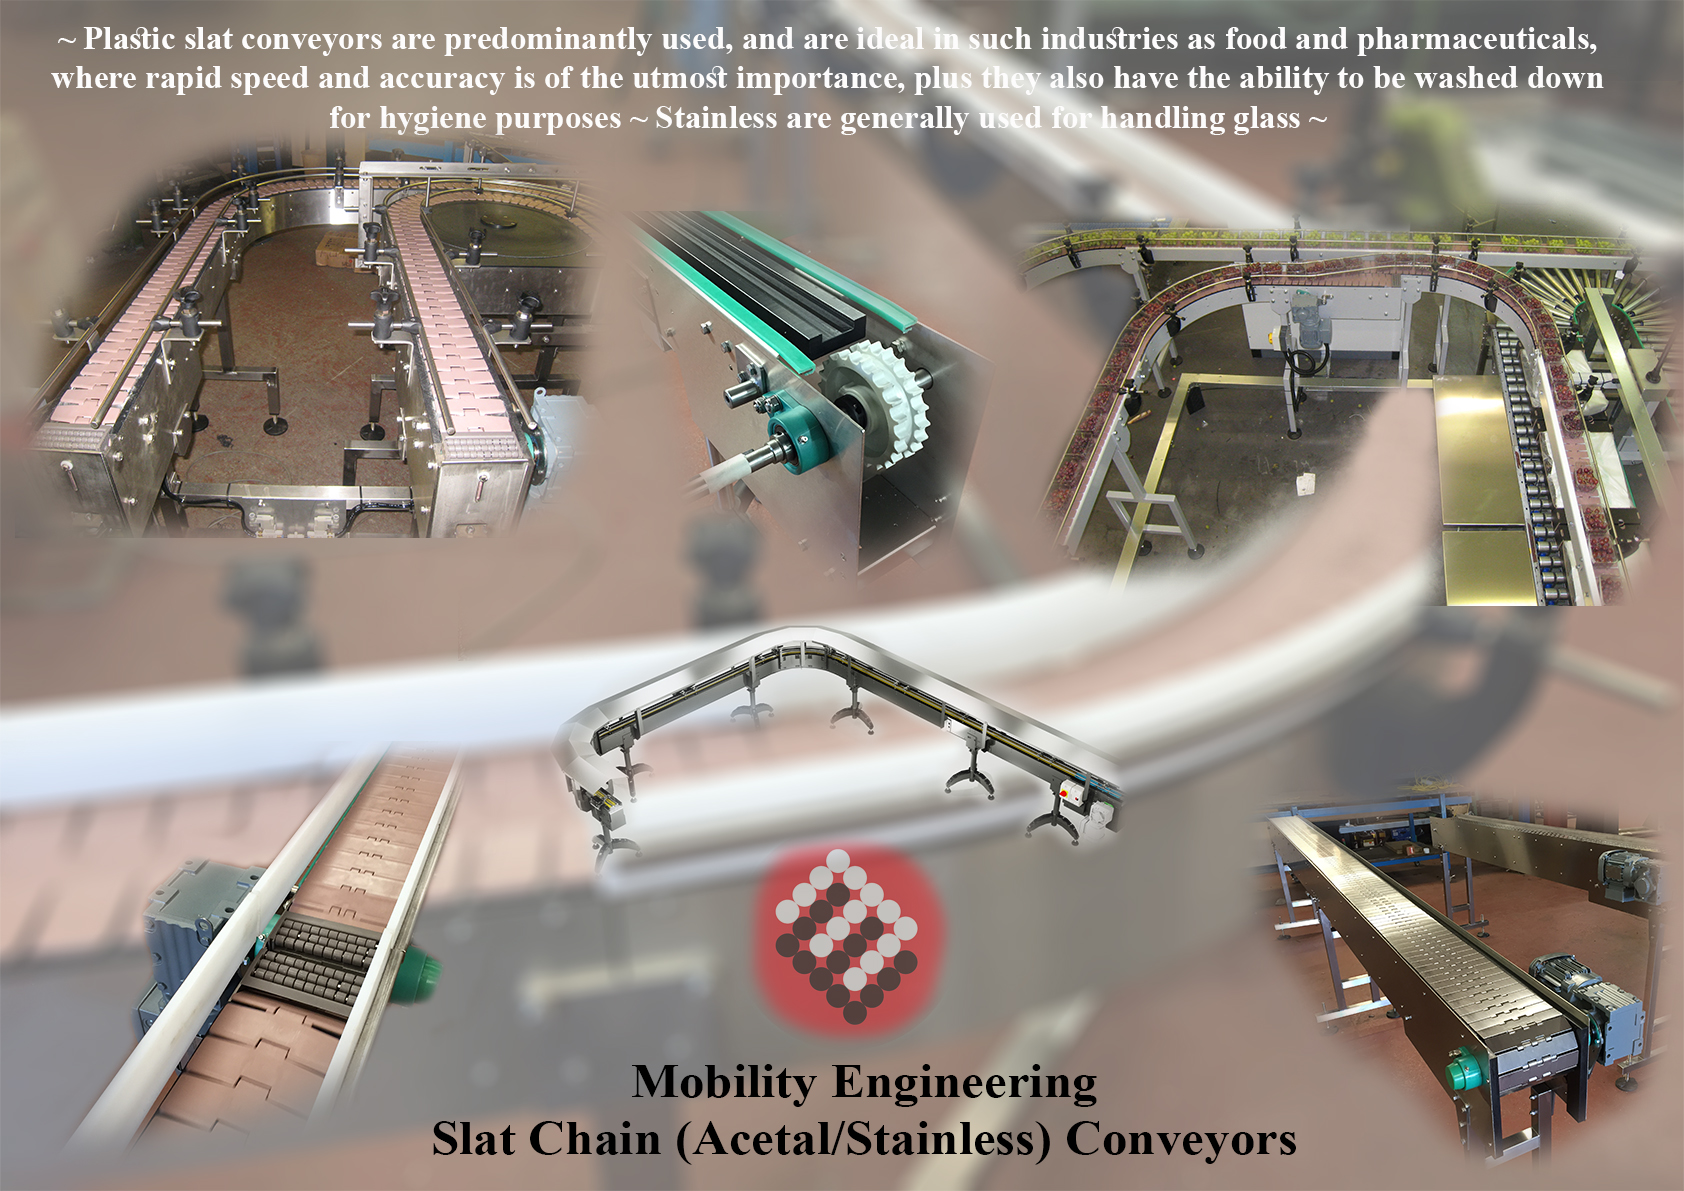 Mobility Engineering (Cheshire) Ltd